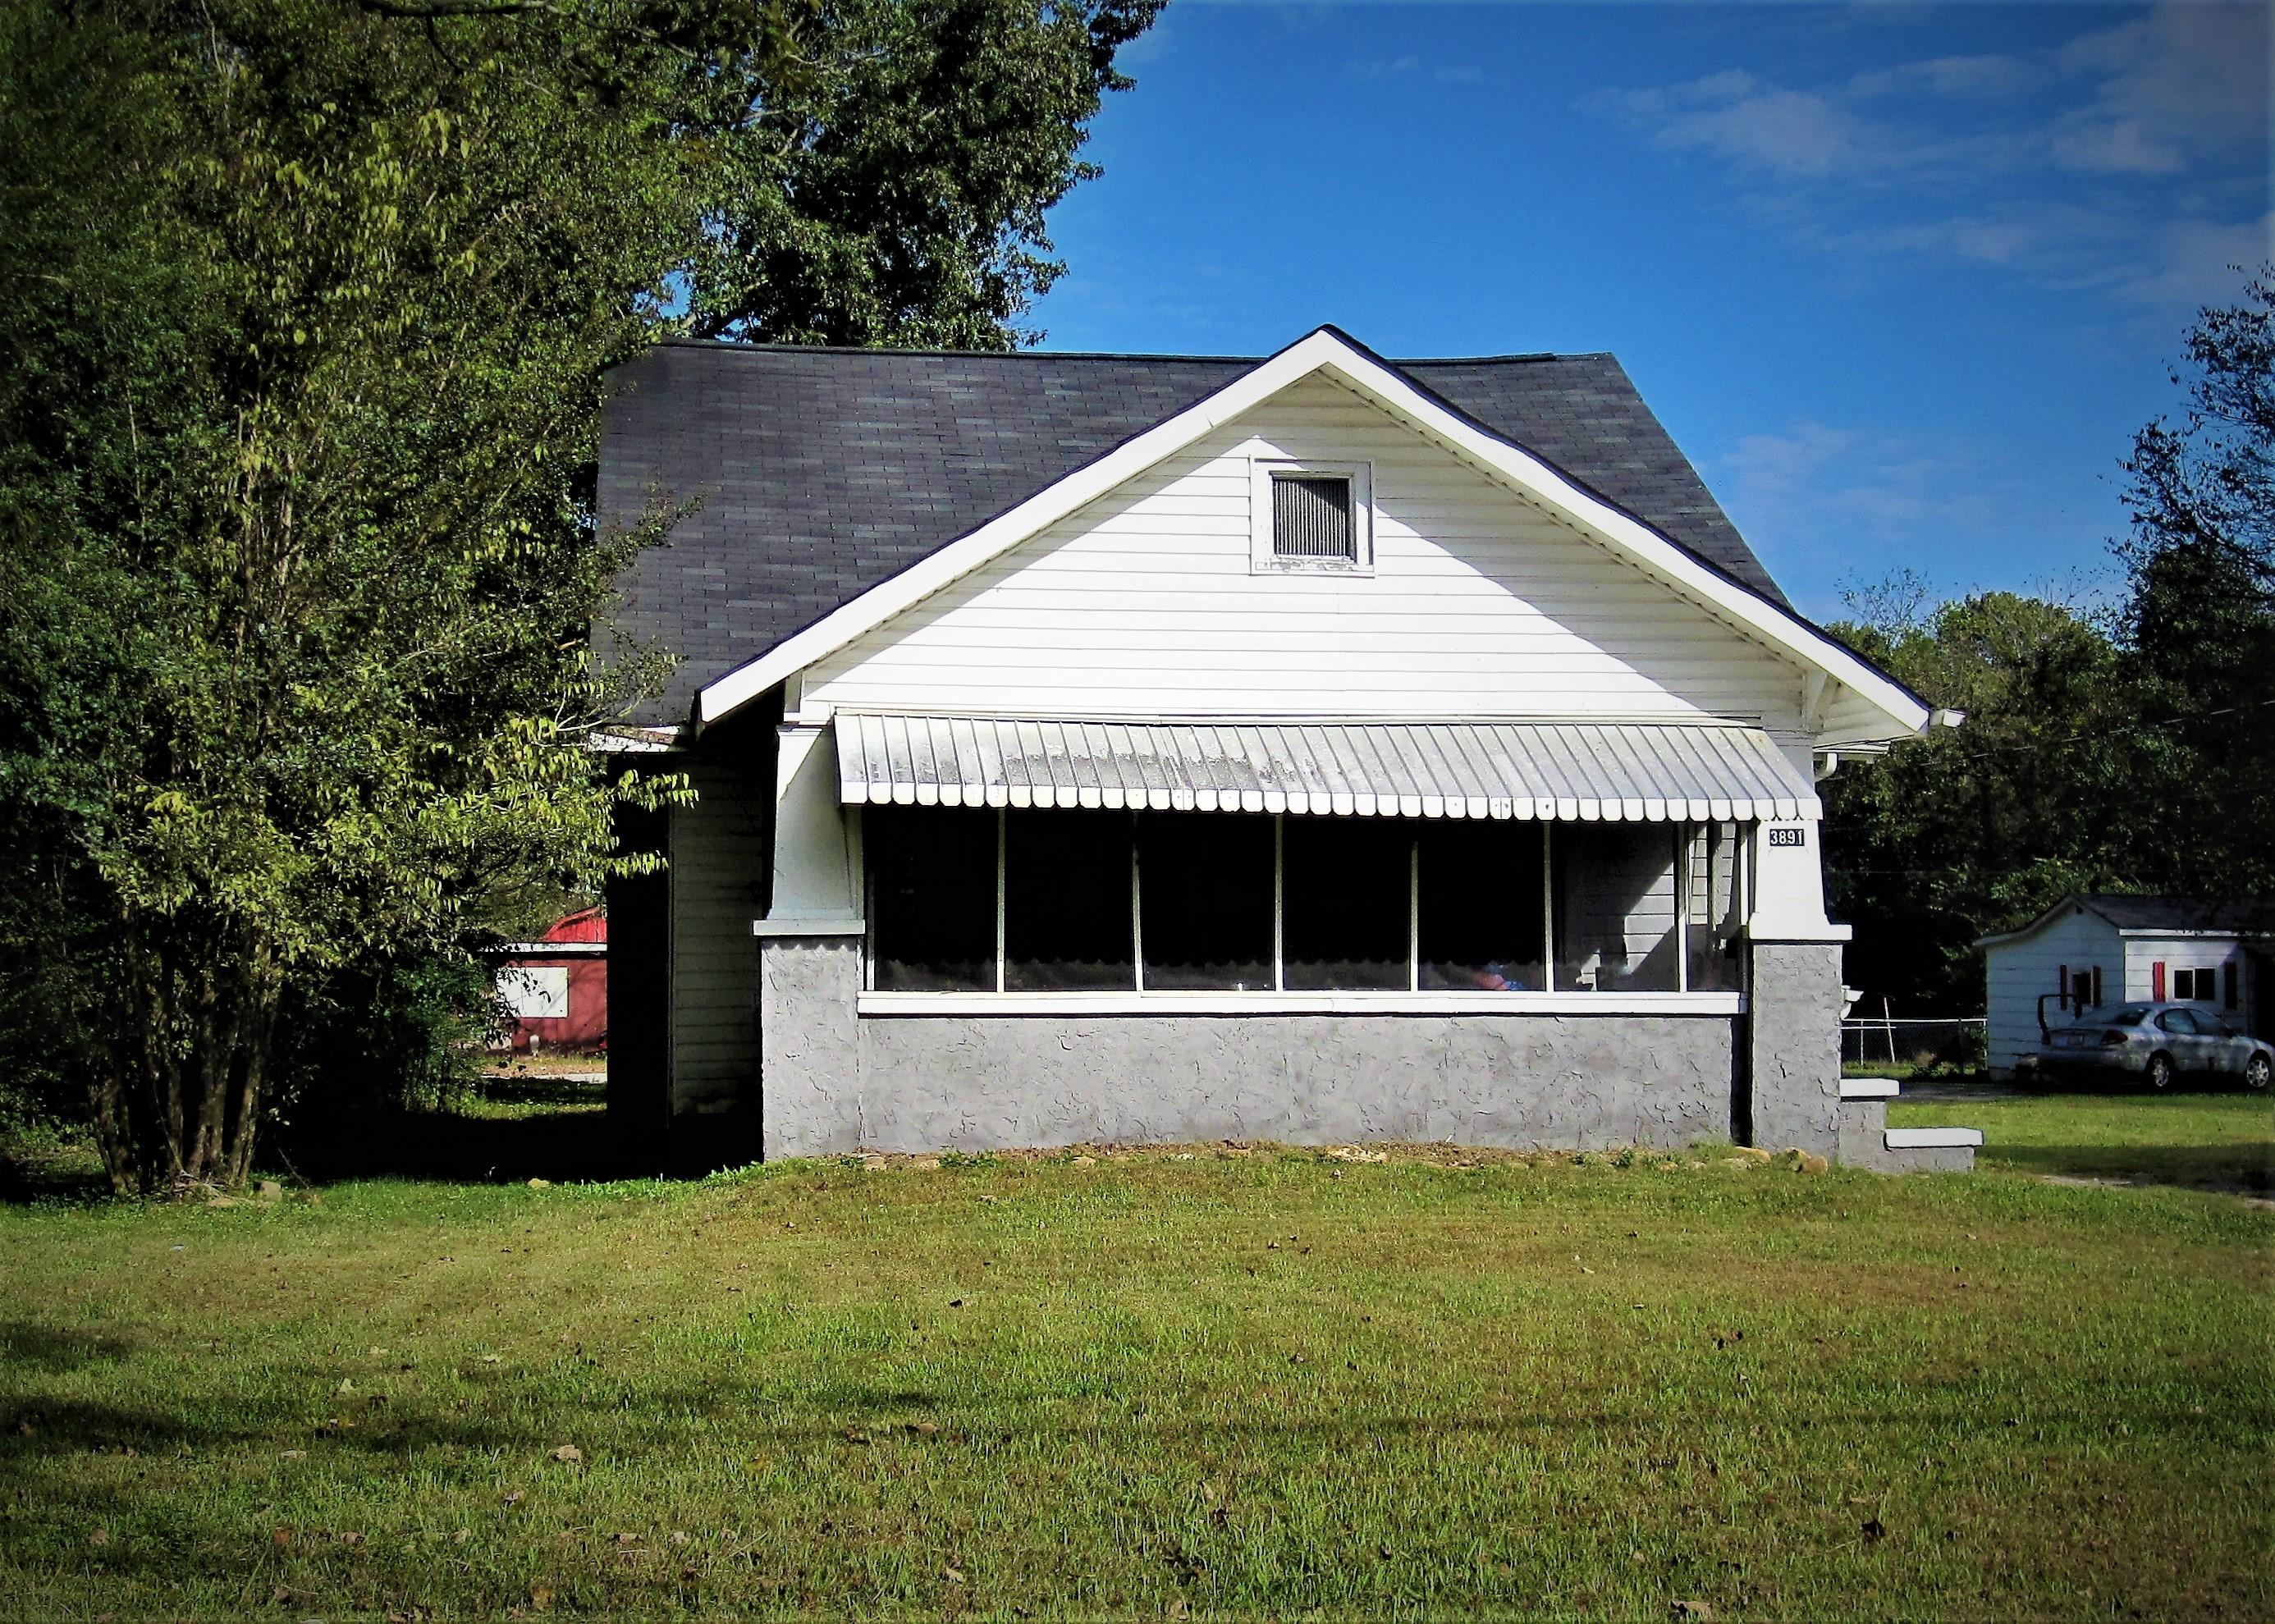 3891 Chattanooga Valley Rd, Flintstone, GA 30725